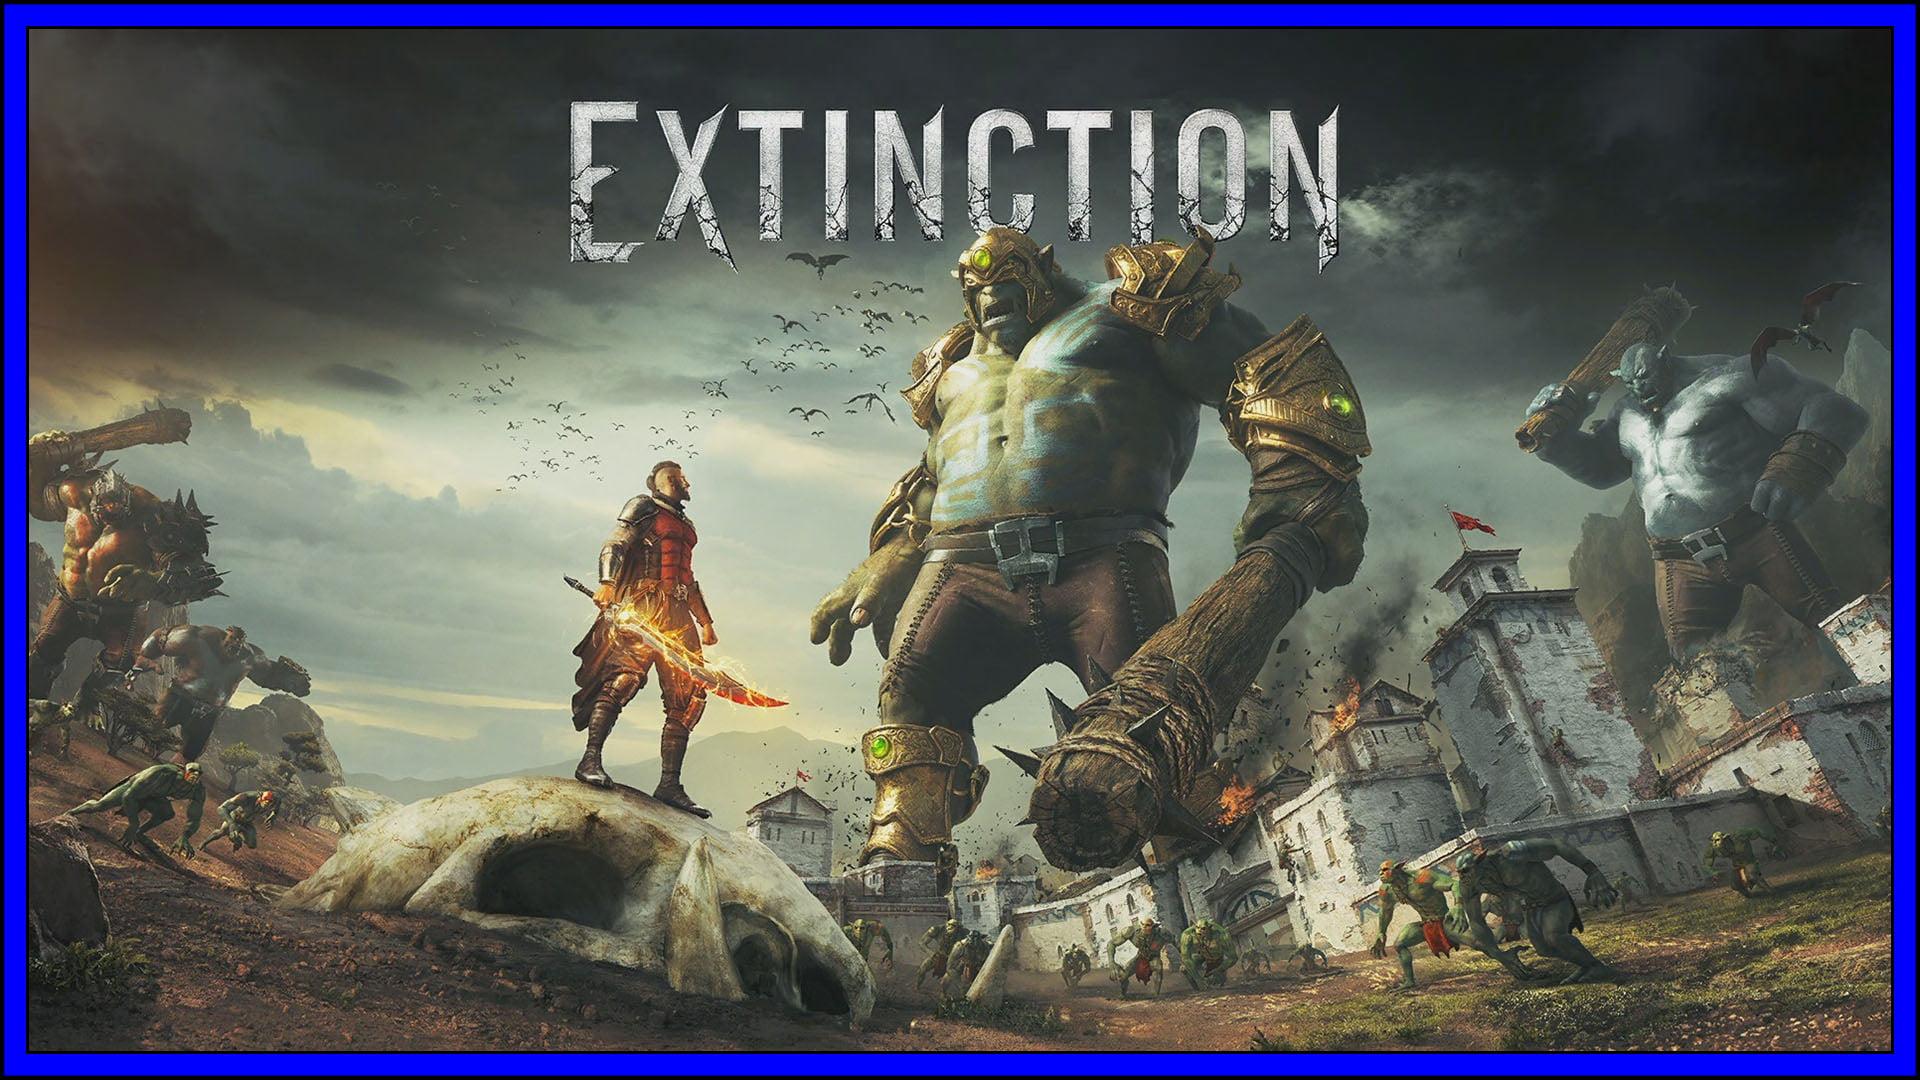 Extinction Fi3